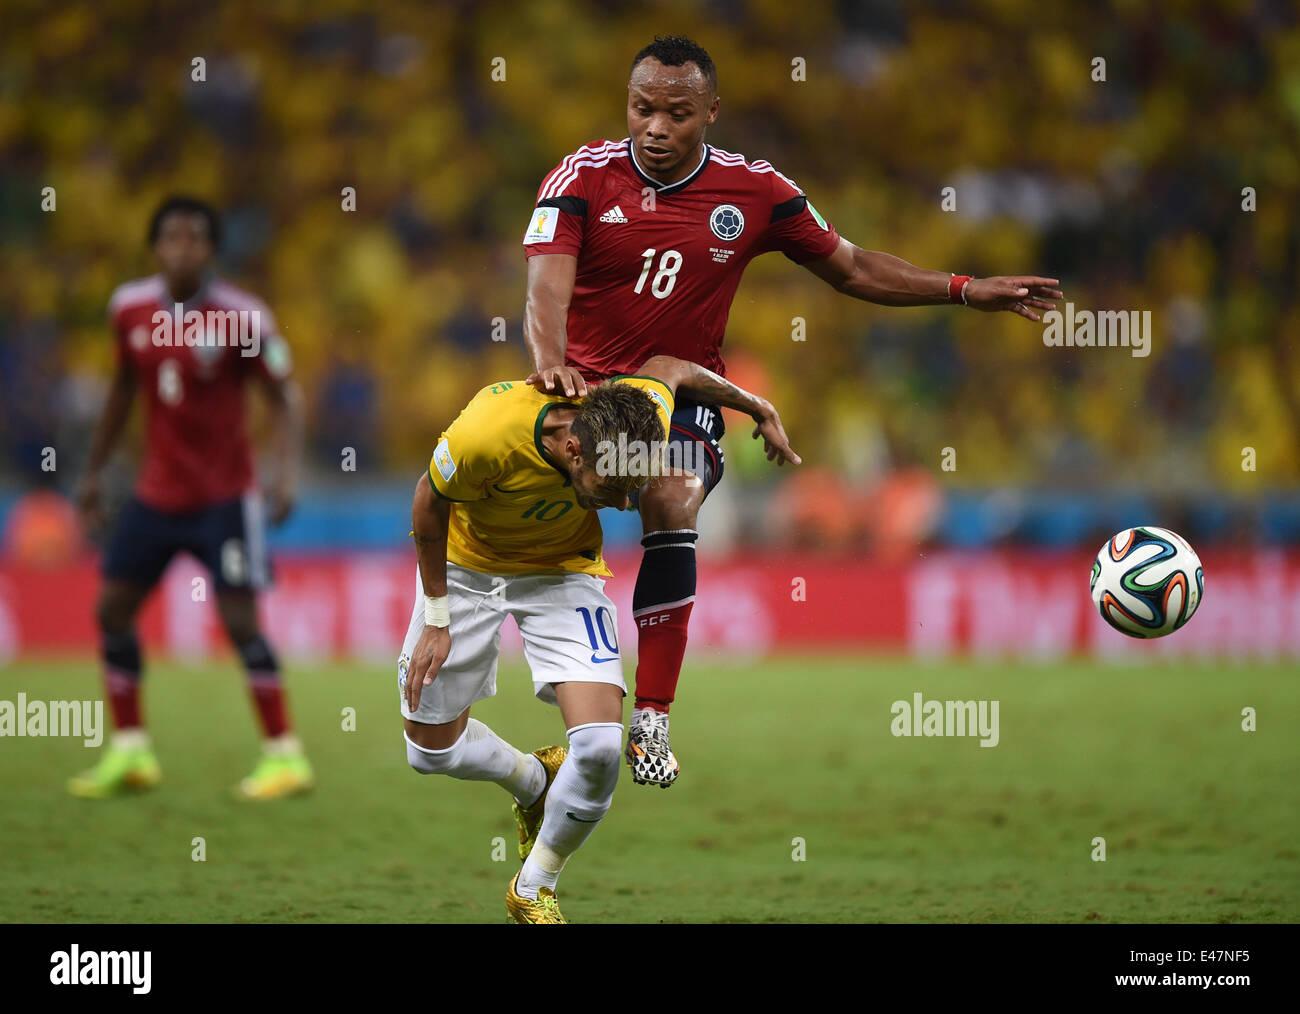 Fortaleza Brazil 04th July 2014 Neymar C of Brazil and Juan